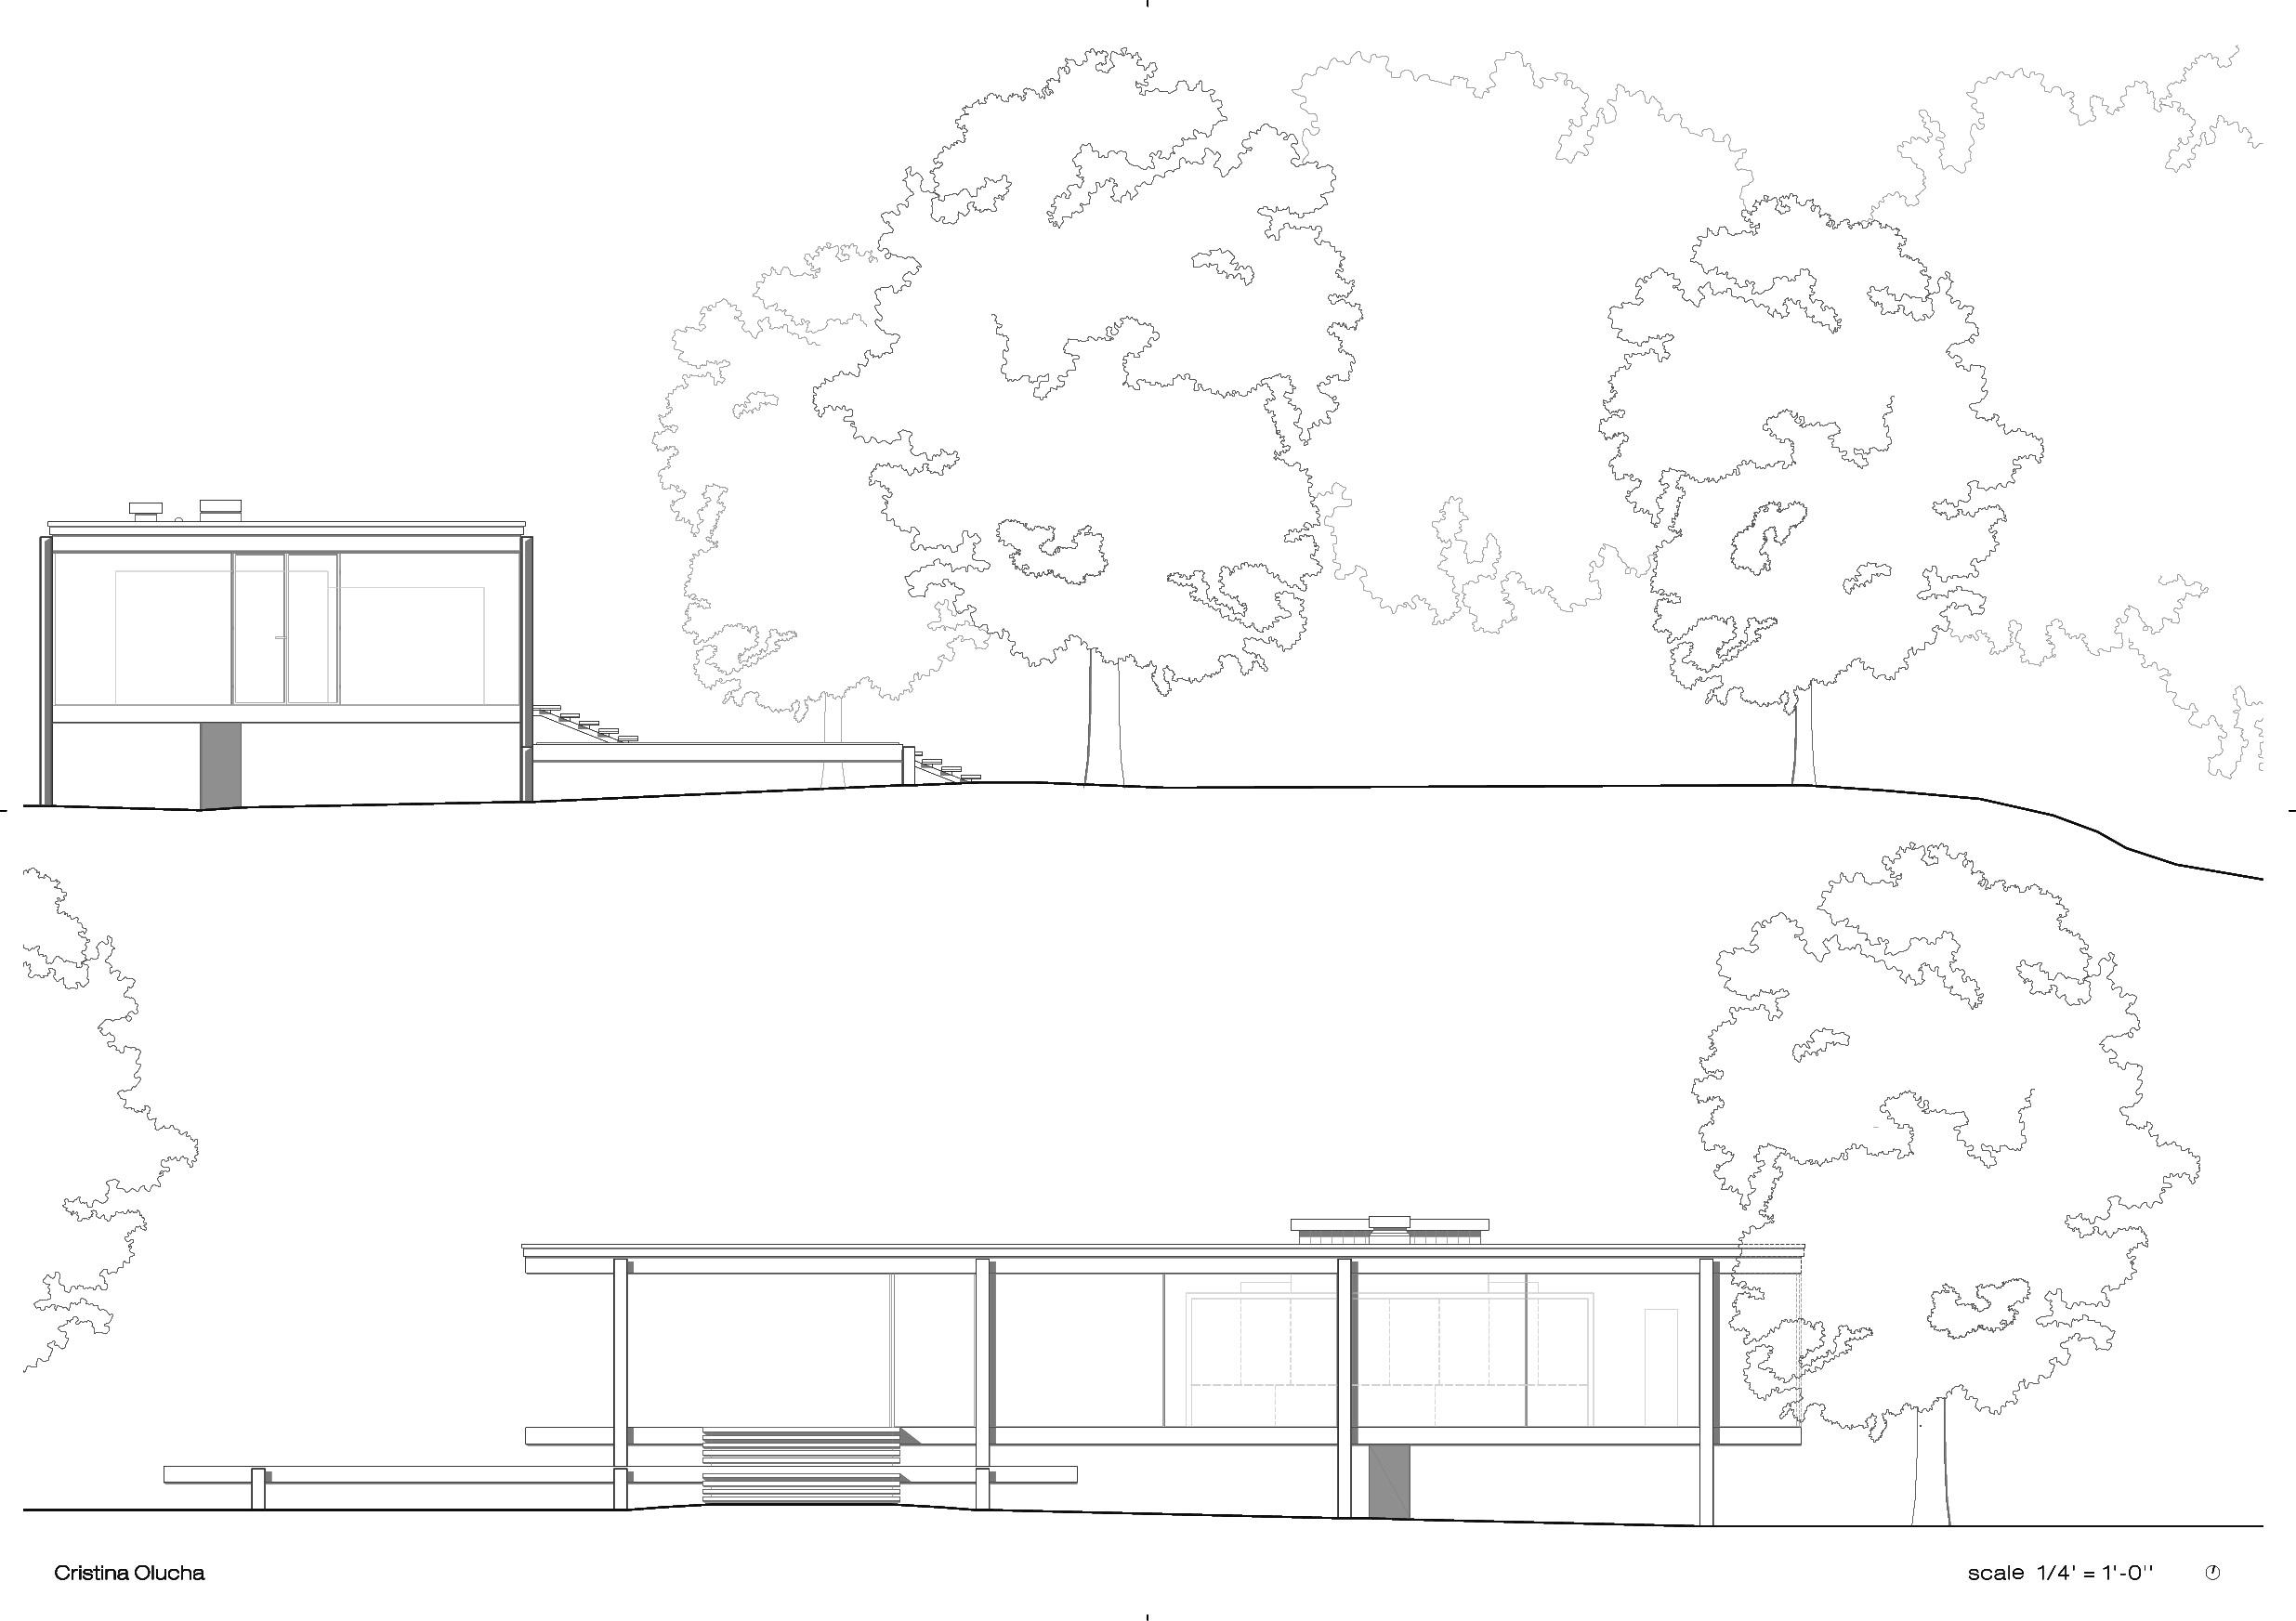 Farnsworth house by Mies Van der Rohe  cristina olucha